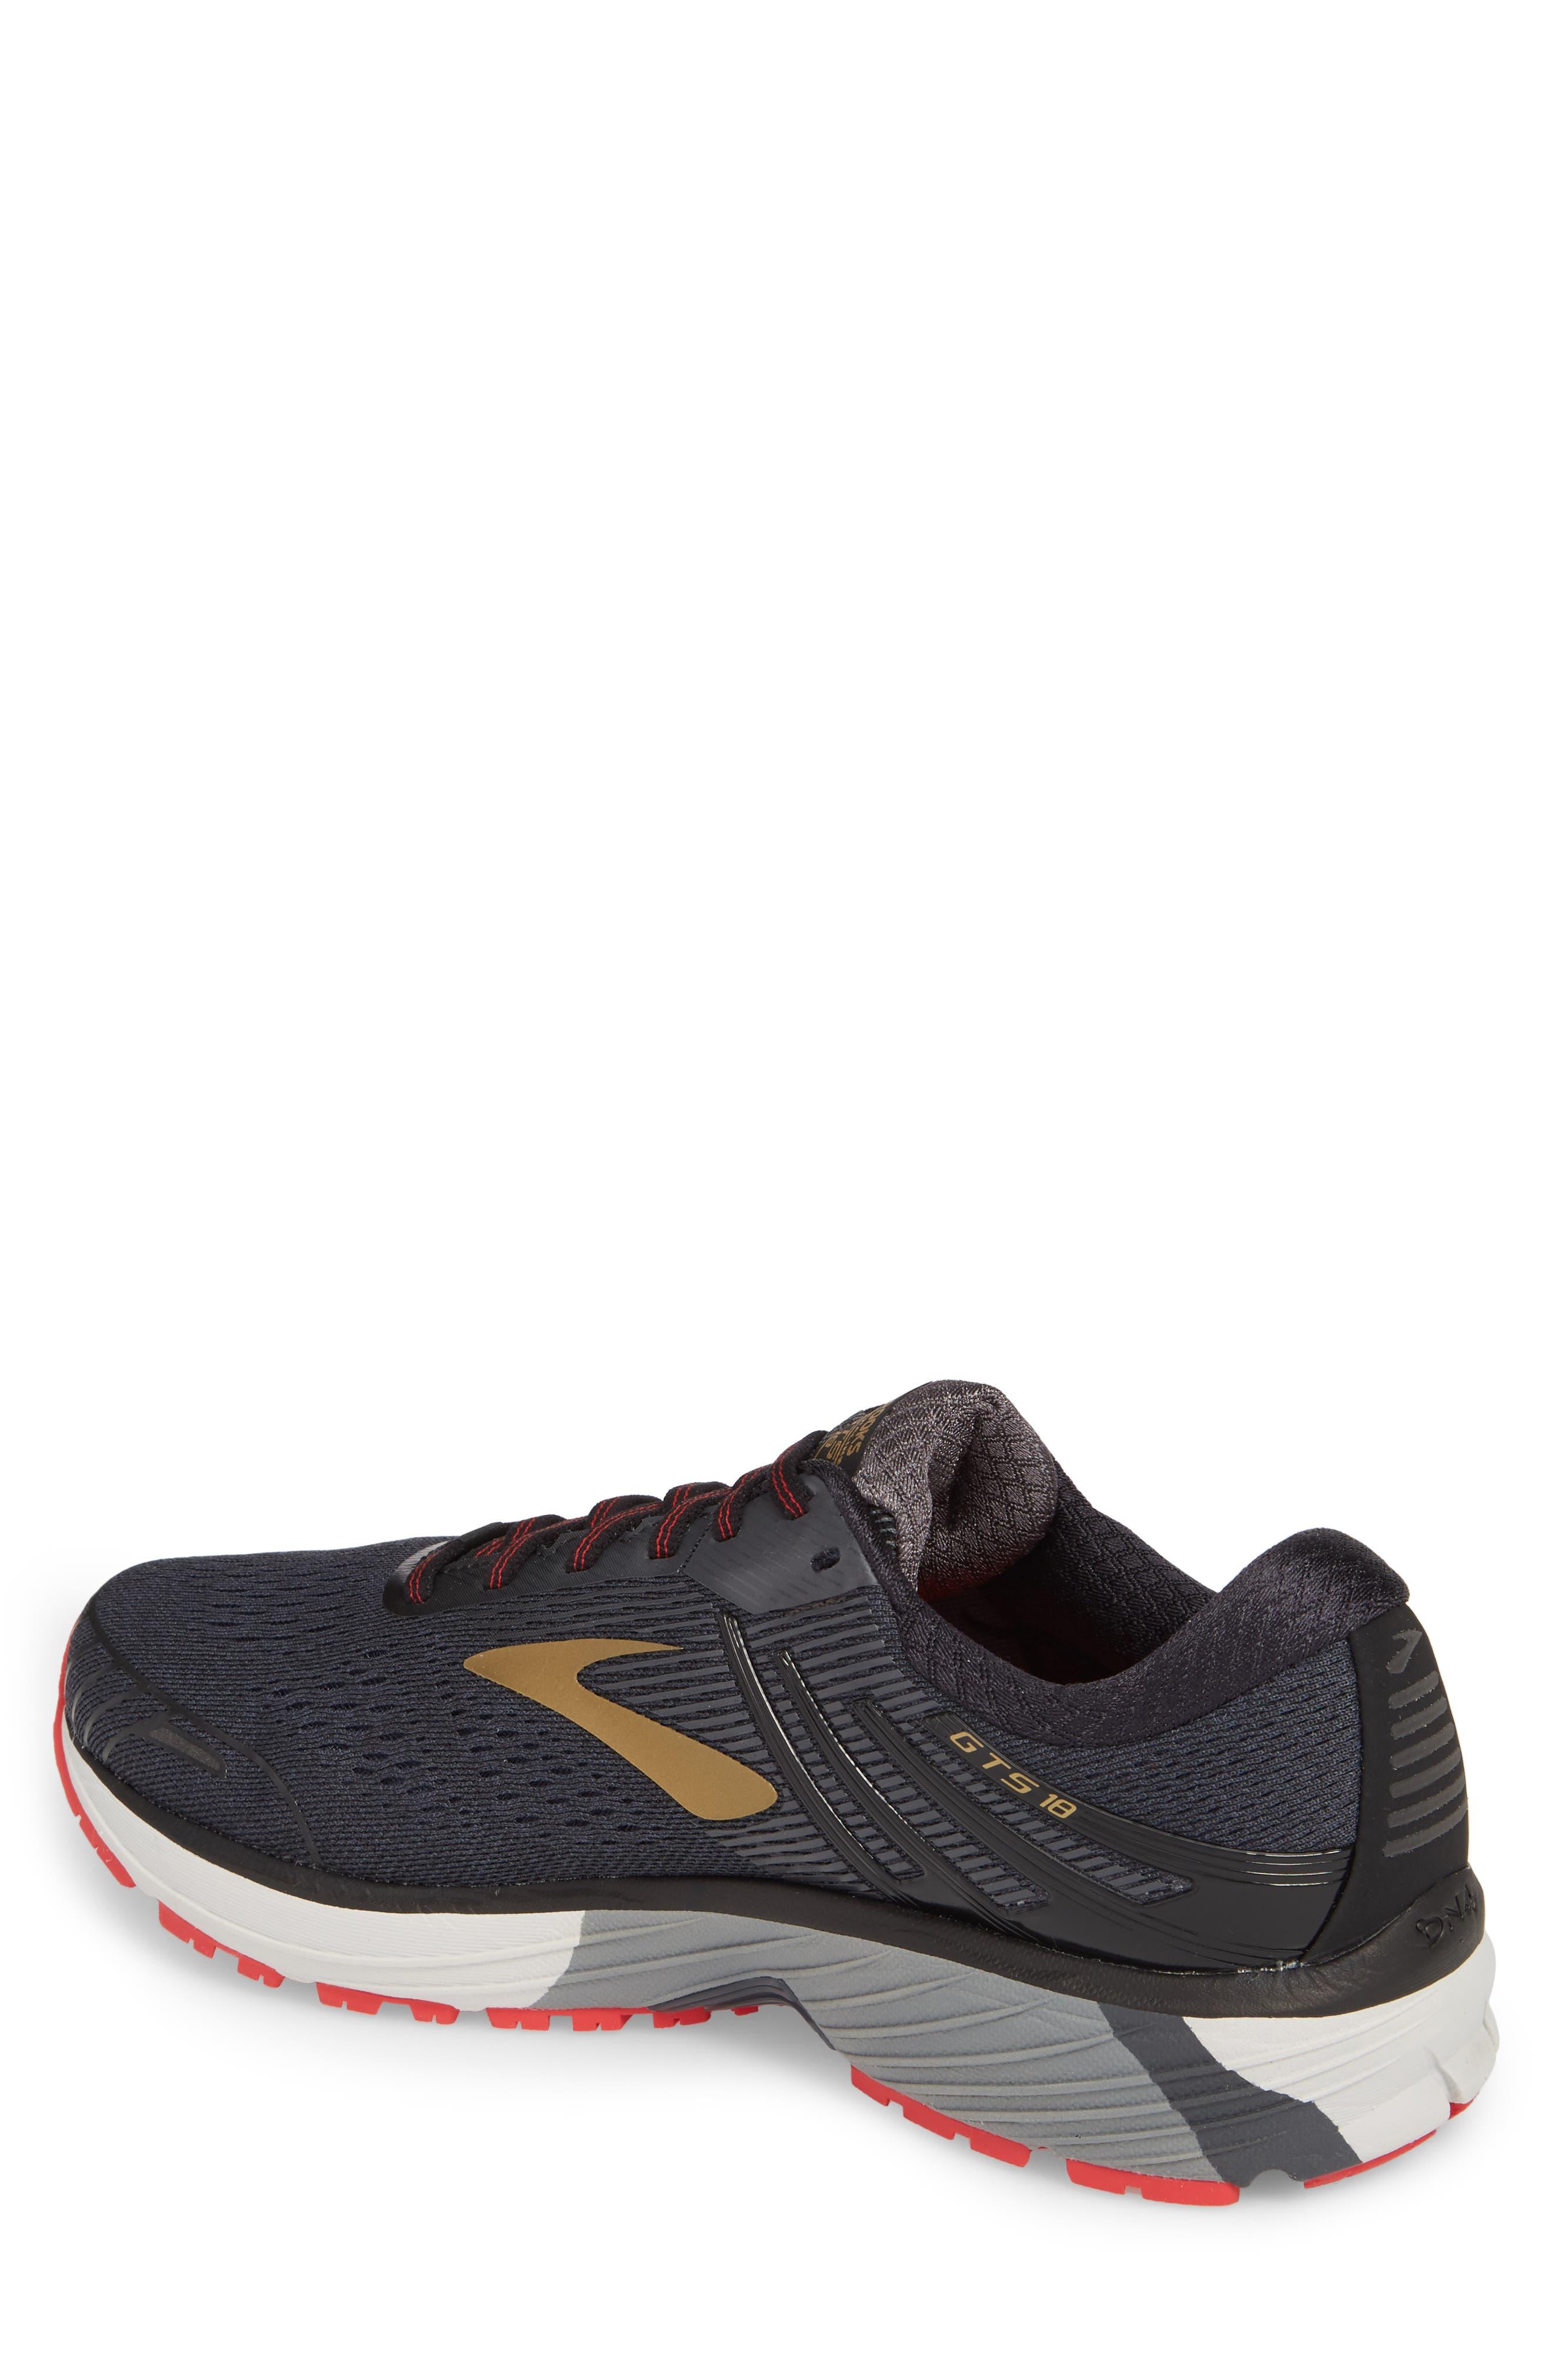 Alternate Image 2  - Brooks Adrenaline GTS 18 Running Shoe (Men)